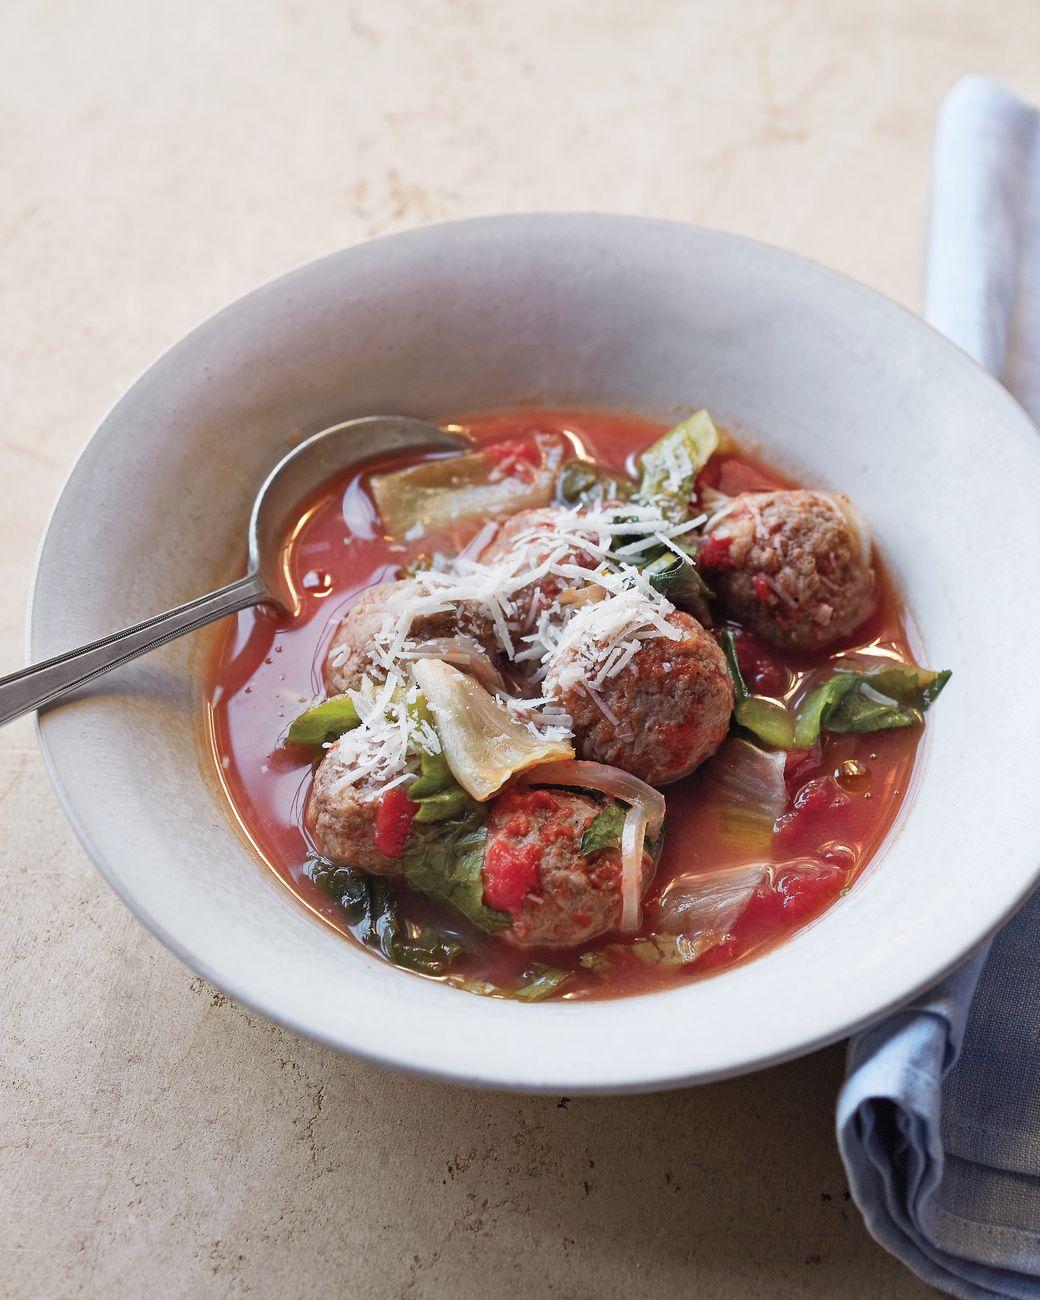 Italian Wedding Soup with Turkey Meatballs Recipe